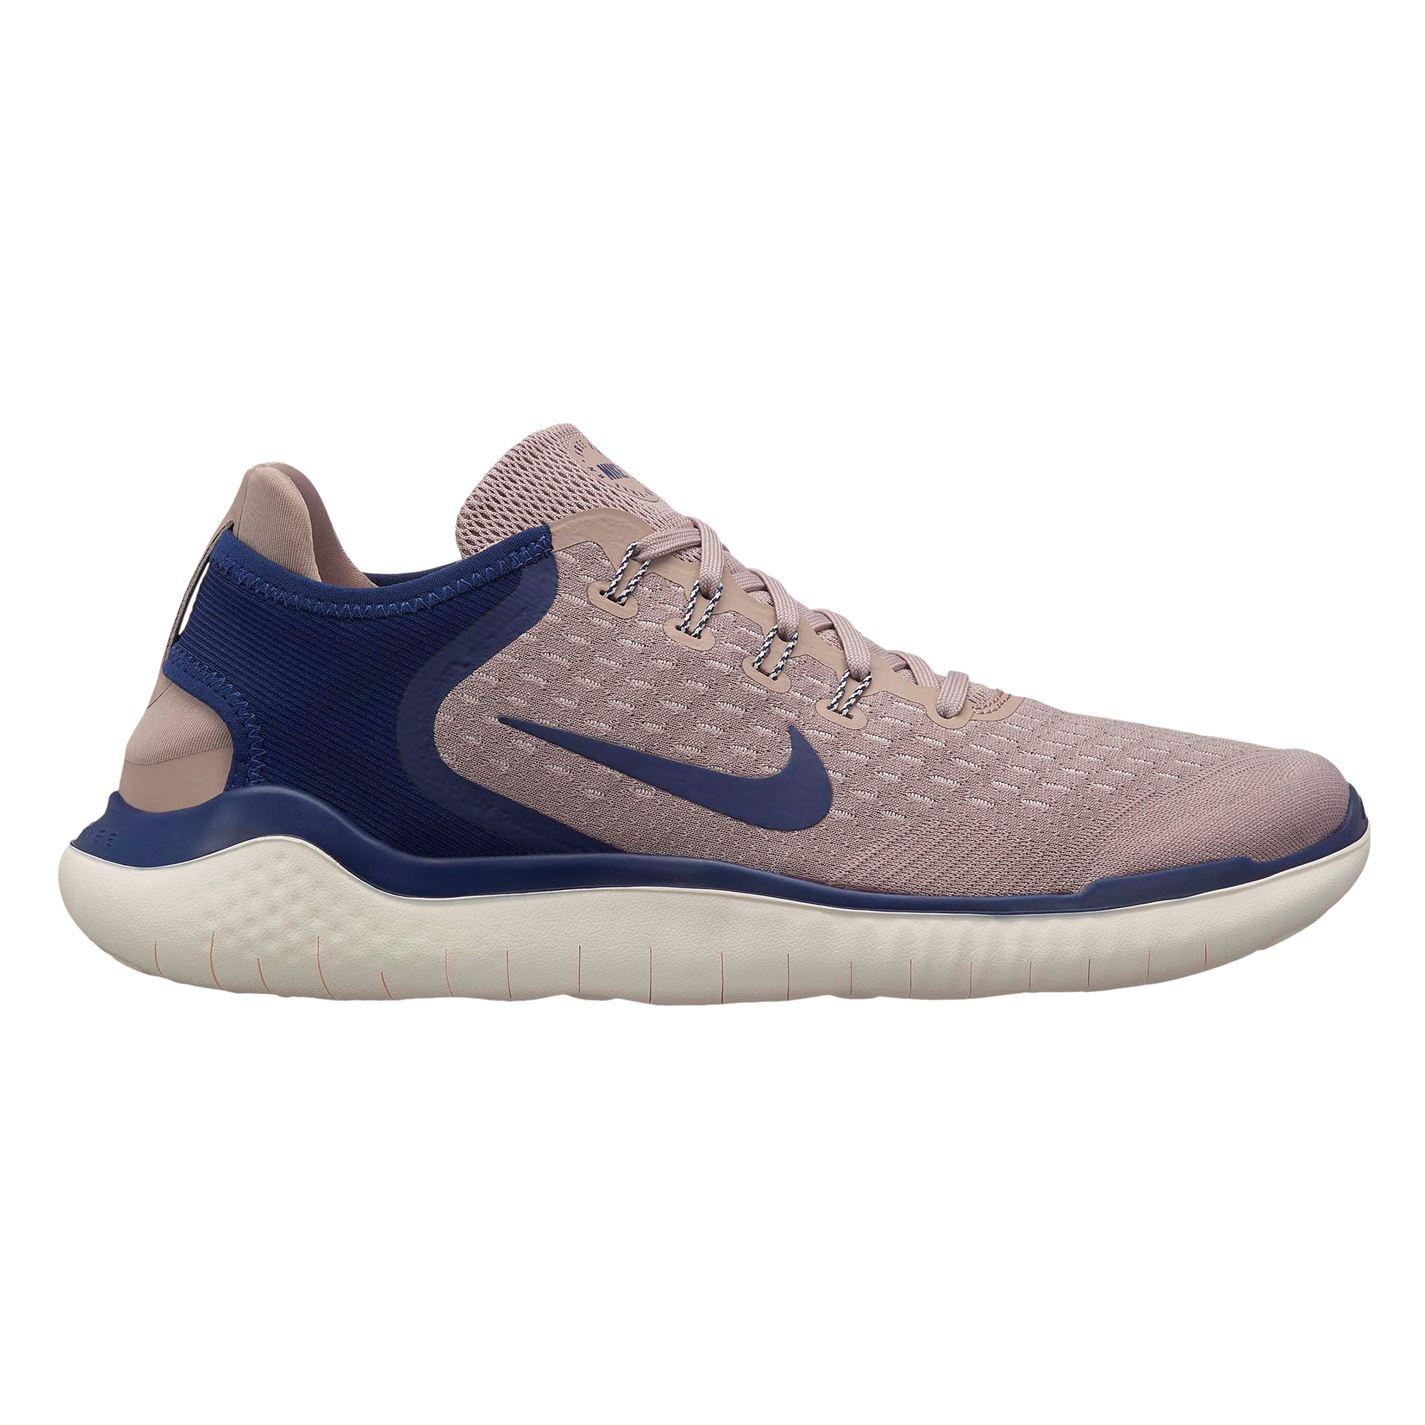 Nike Free Run 2018 pánska bežecká obuv Purple. Nike Free Run 2018 pánska bežecká  obuv Purple  Nike Free Run 2018 pánska bežecká obuv Purple 7a2f18780b1